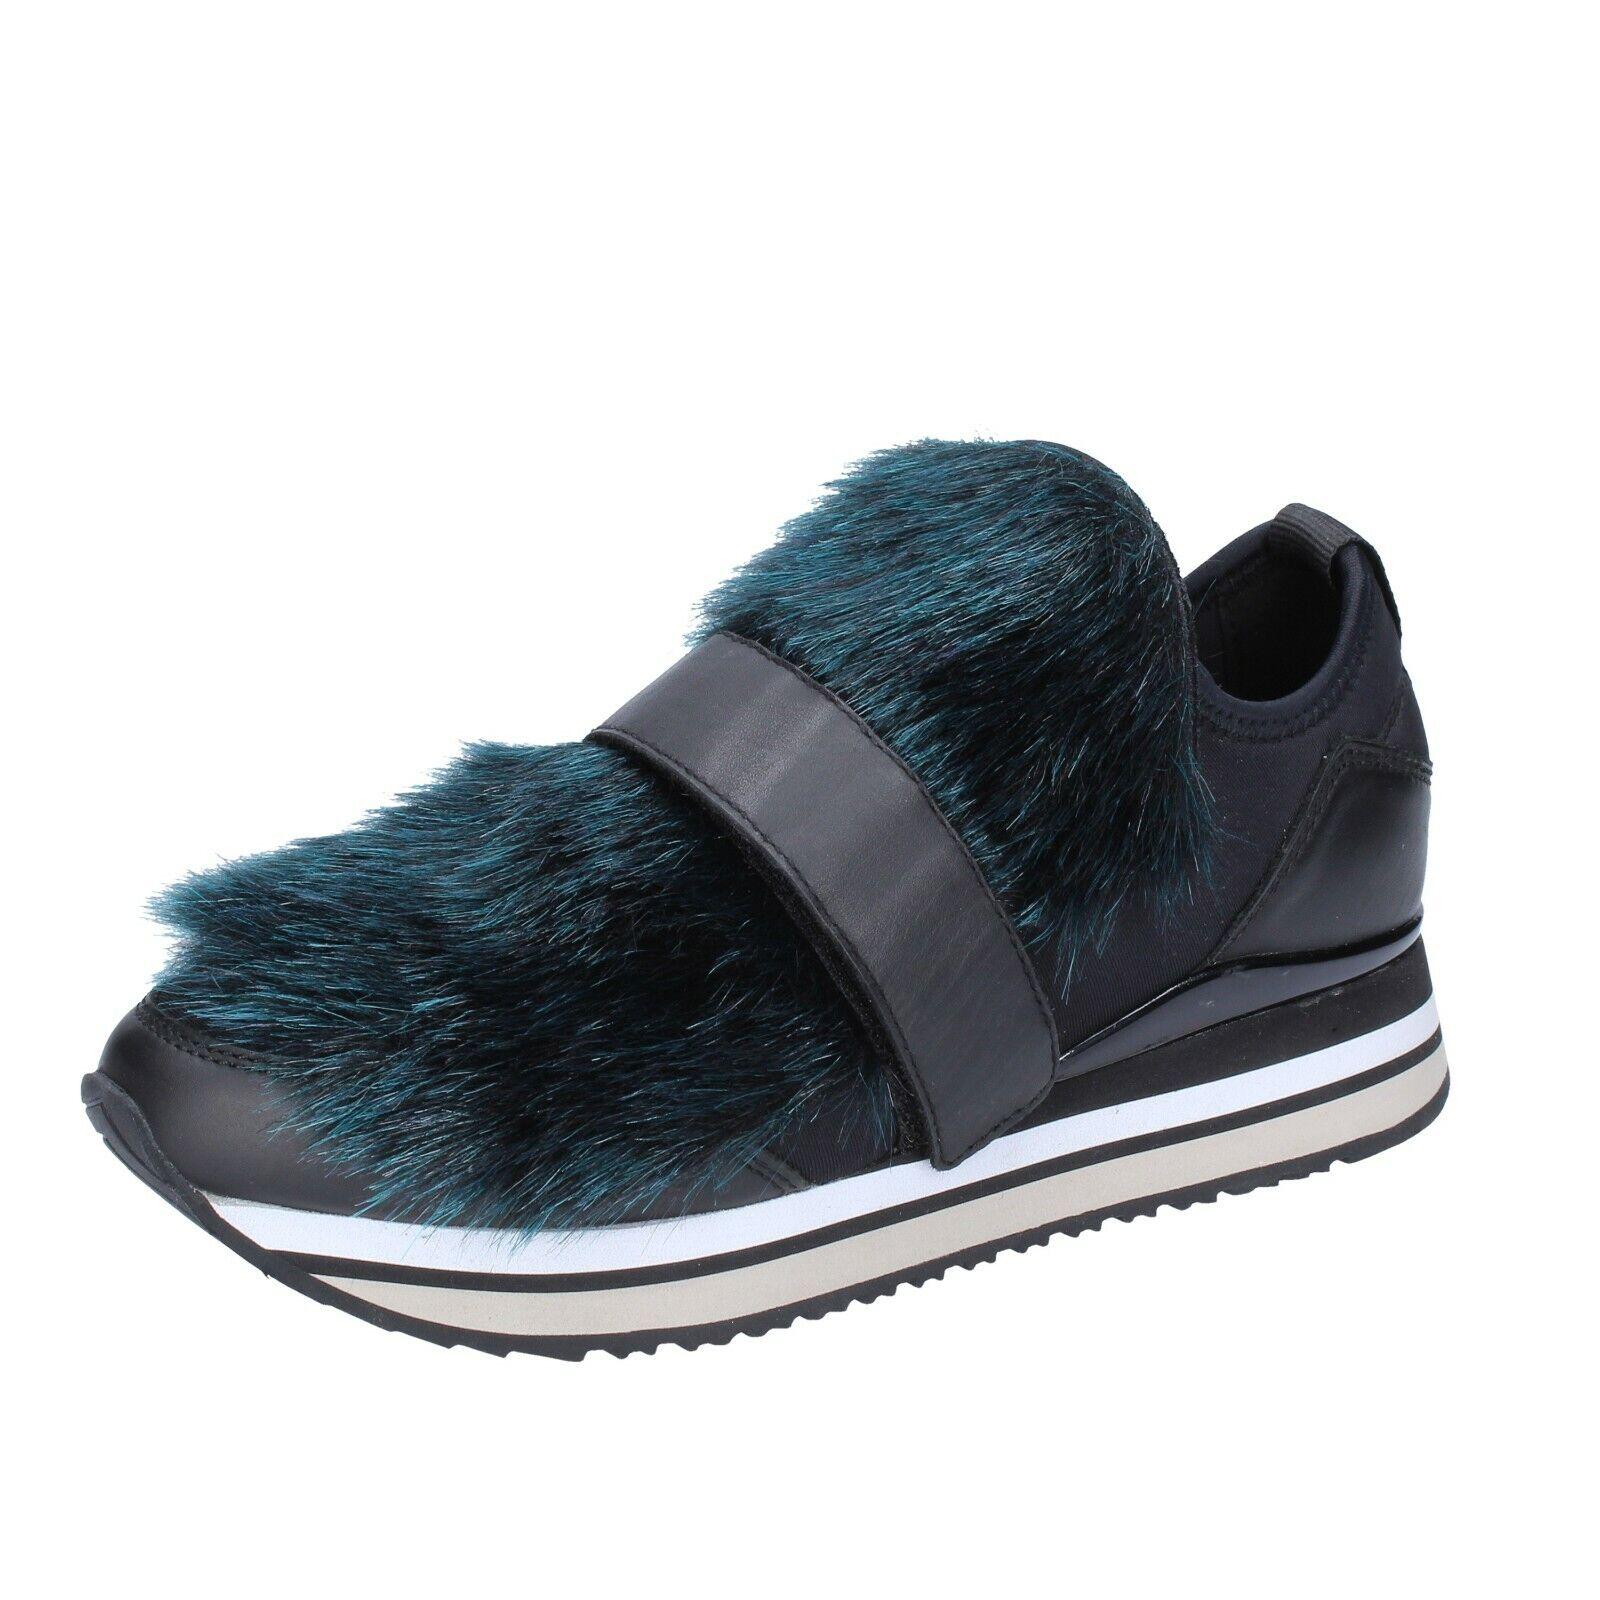 Womens shoes CRIME LONDON 4 (EU 37) slip on black textile leather fur BS950-37